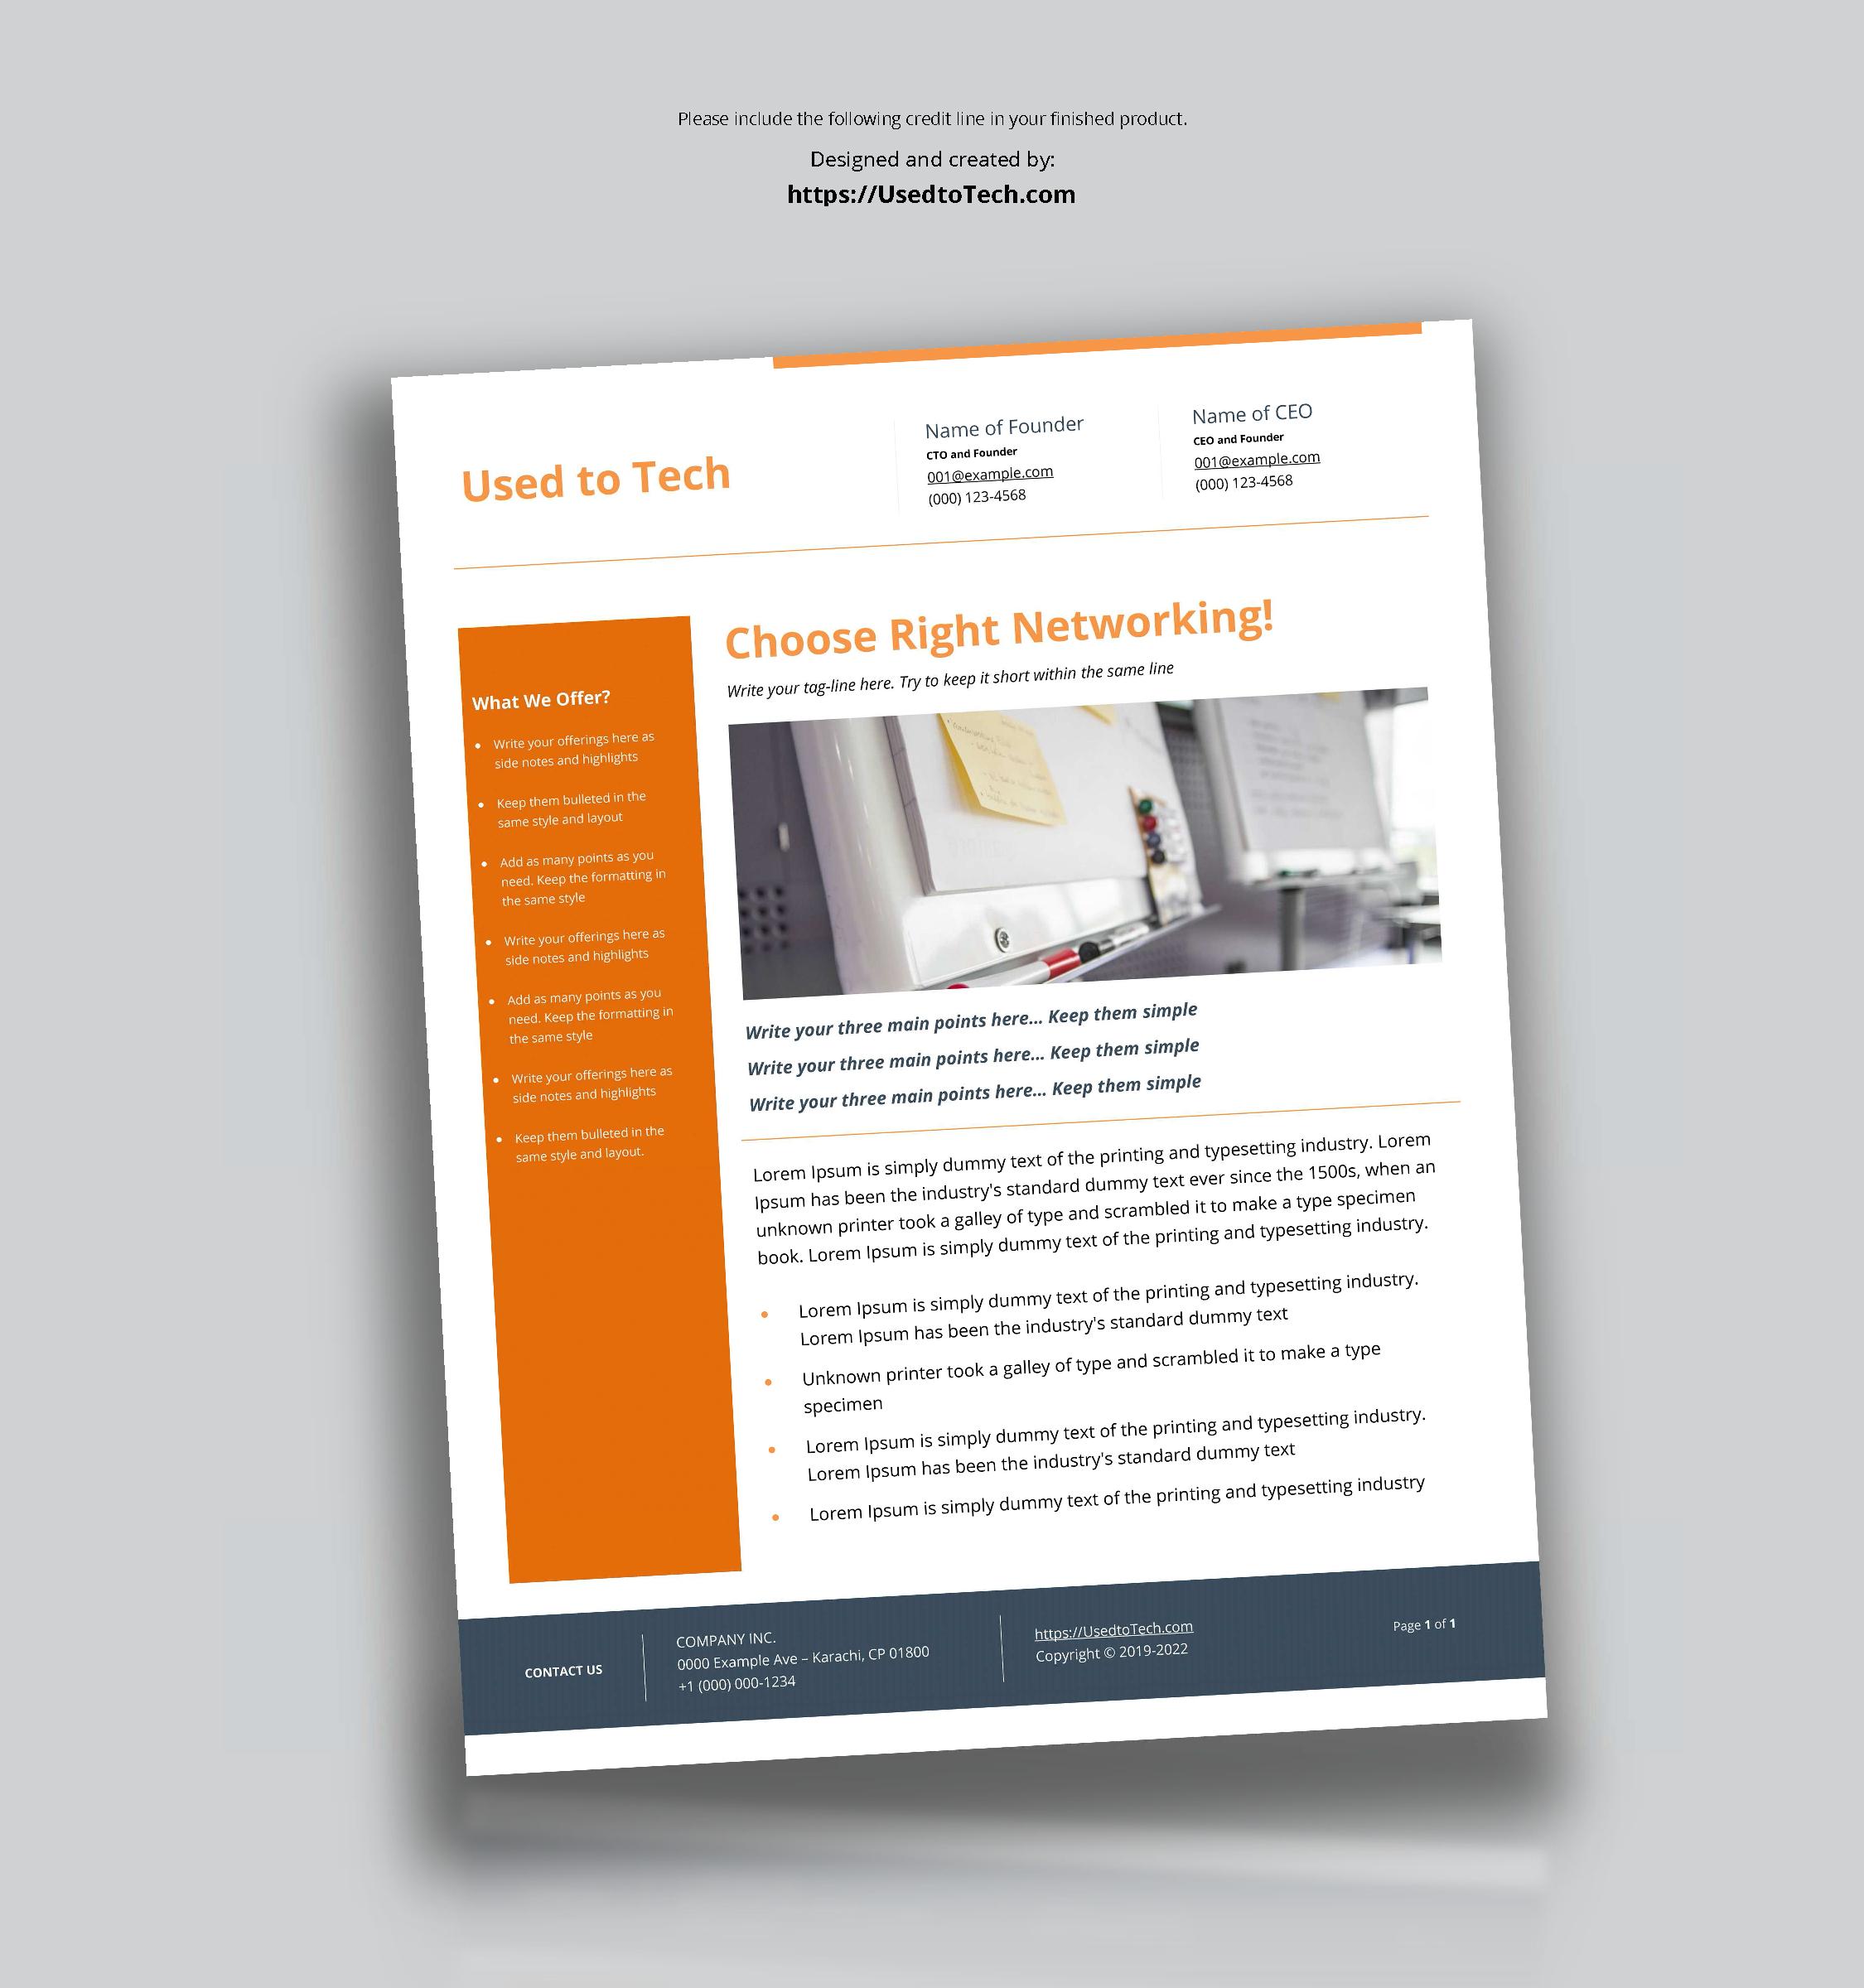 003 Flyer Design Template Header Free Templates For Flyers Throughout Free Templates For Flyers Microsoft Word